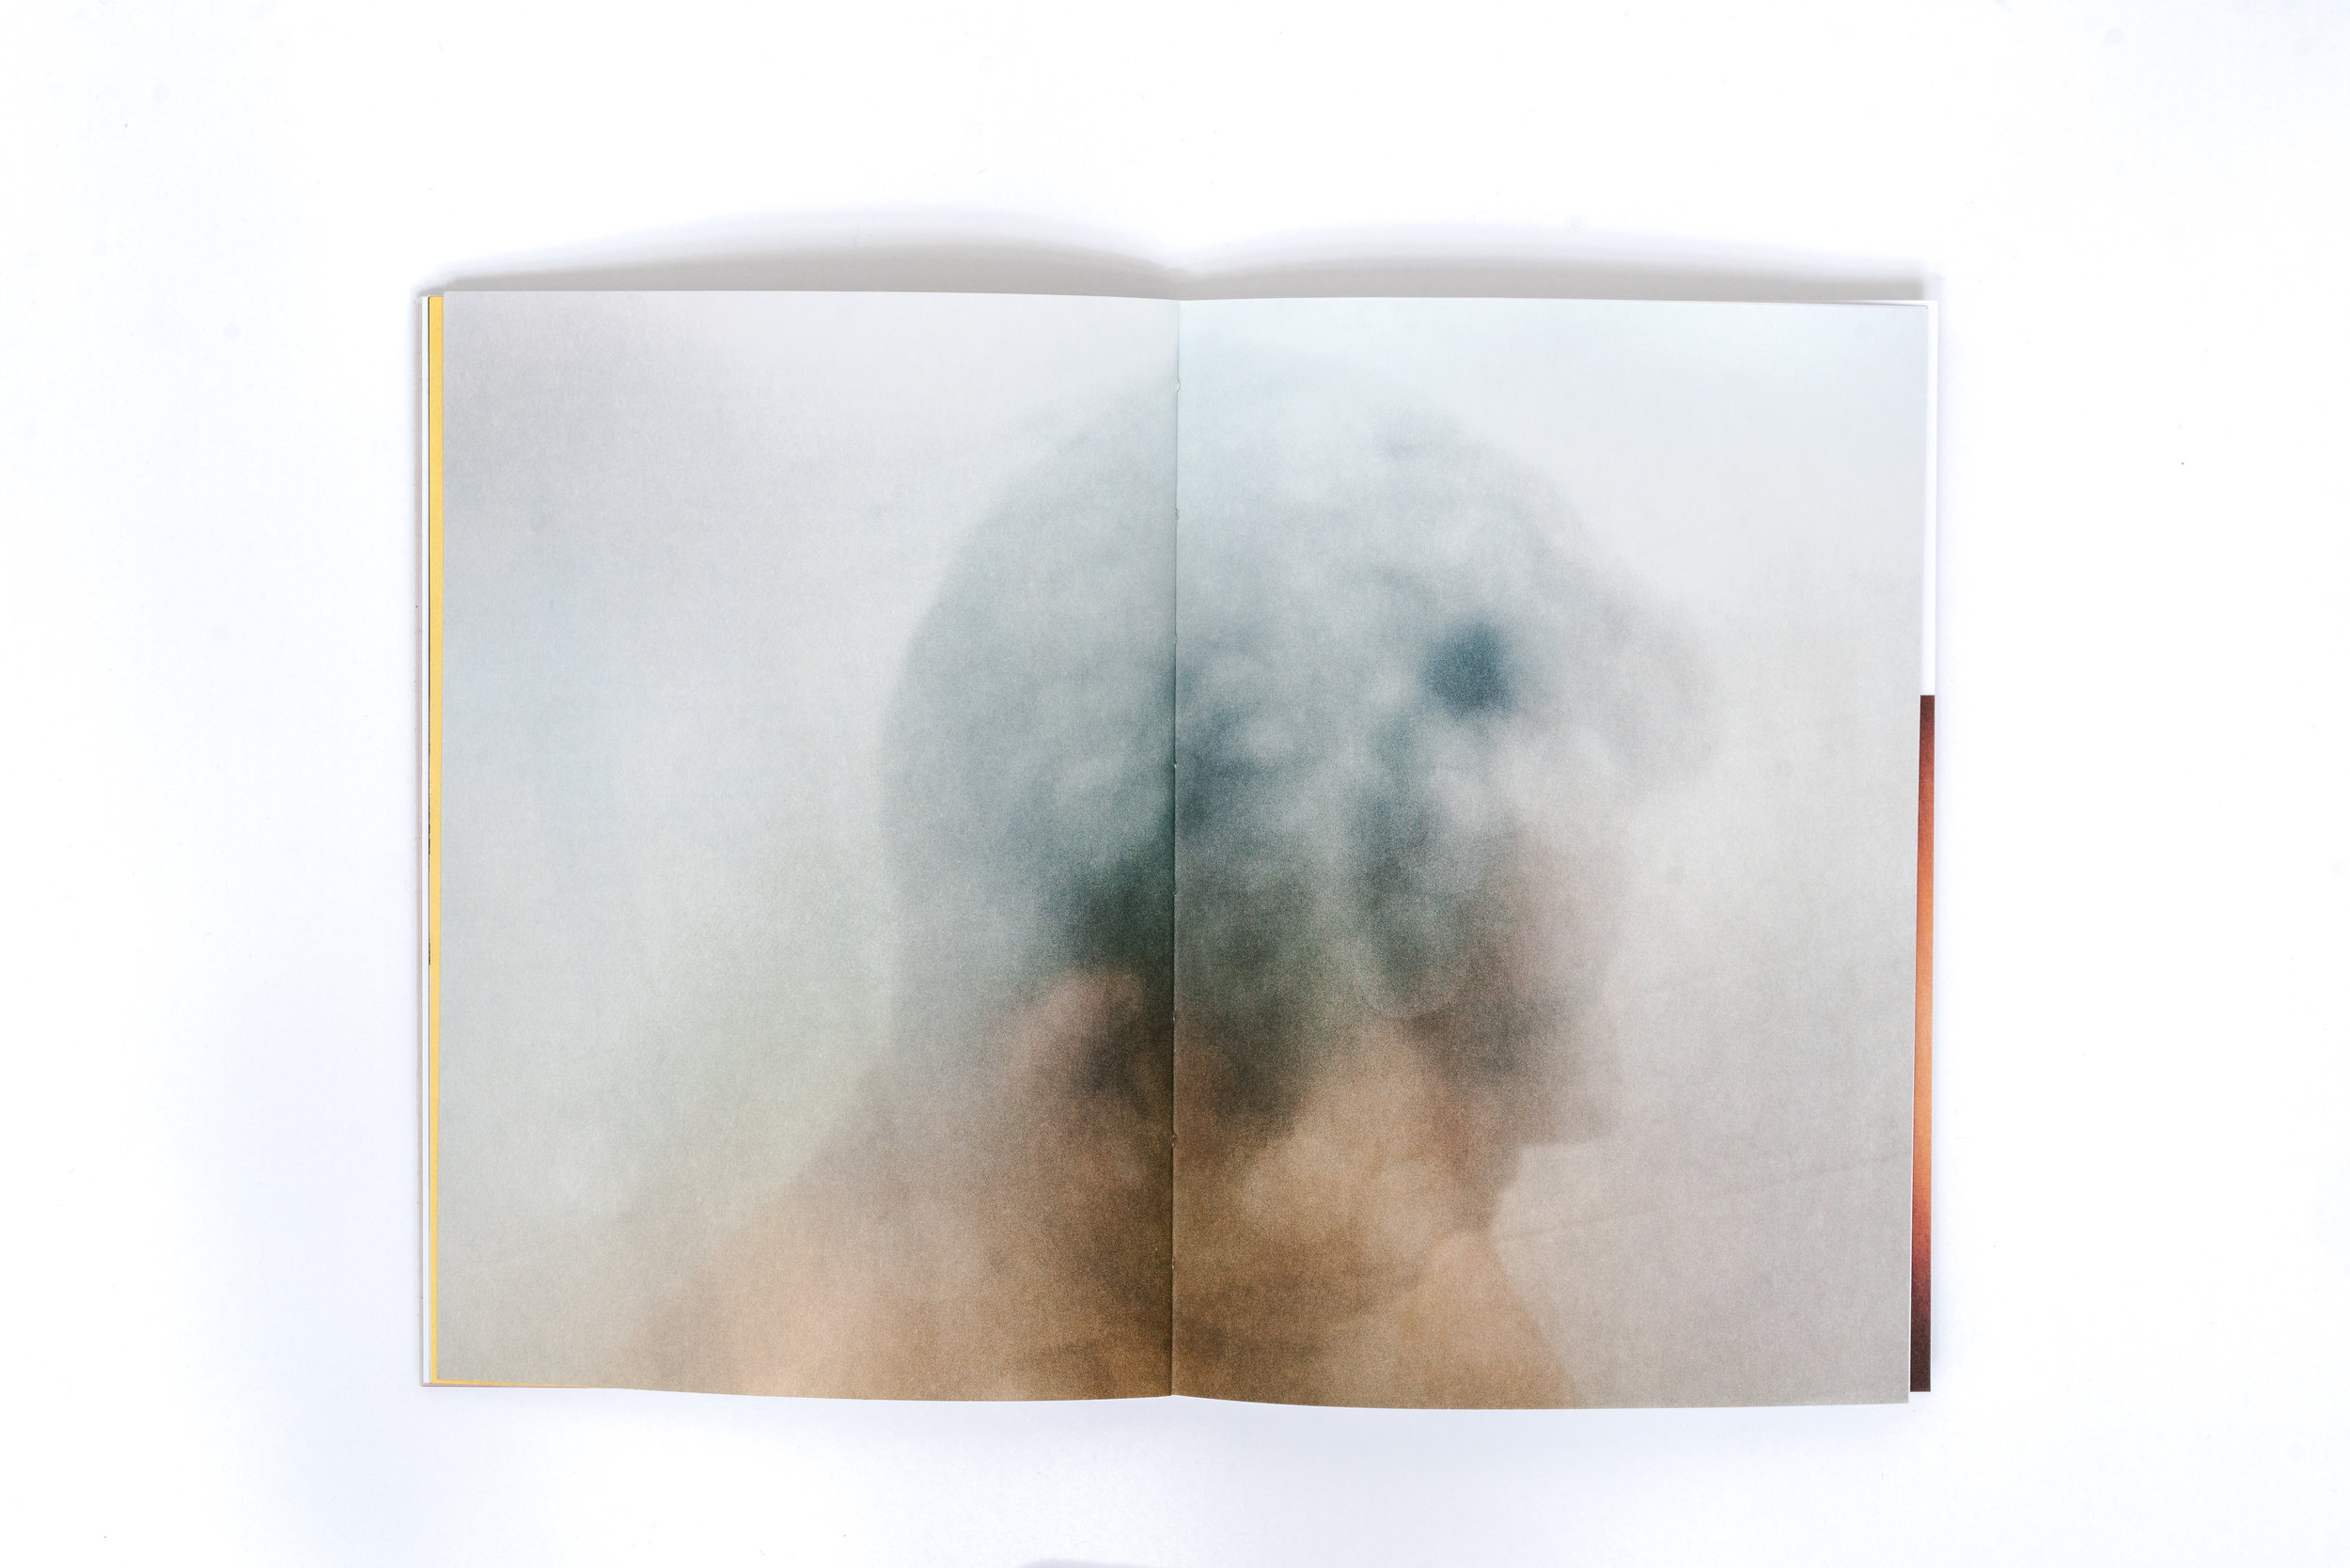 When-We-Were-Strangers_Jake-Naughton_Juan-Sosa_Book-Views-06150.jpg